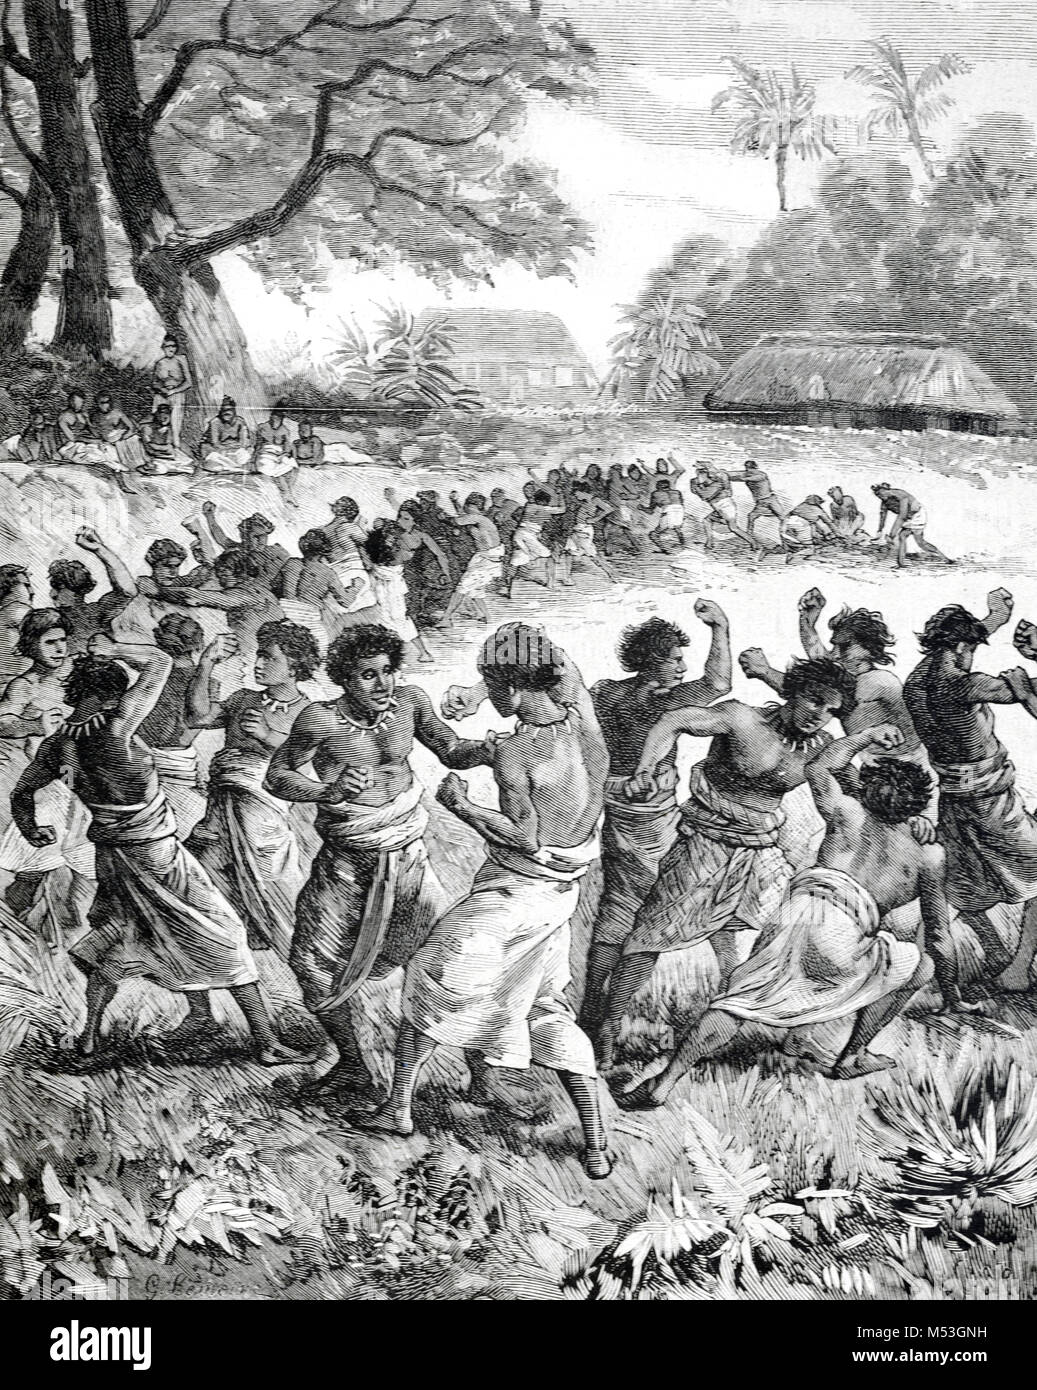 Les hommes de Tonga Tonga en boxe, ou le Royaume de Tonga, Polynésie française (gravure, 1988) Photo Stock